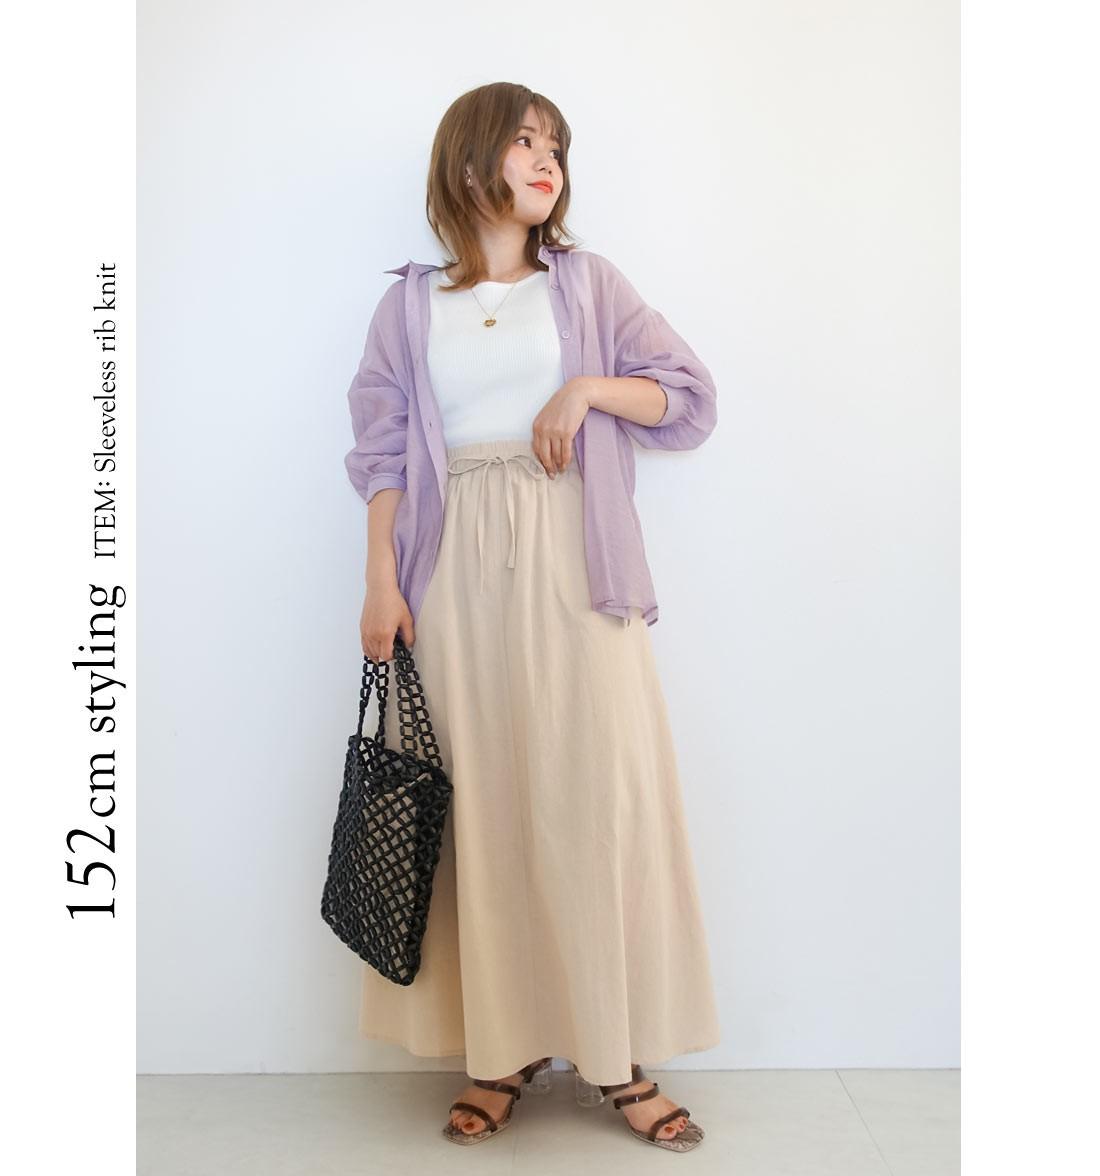 152cm styling ITEM: Sleeveless rib knit